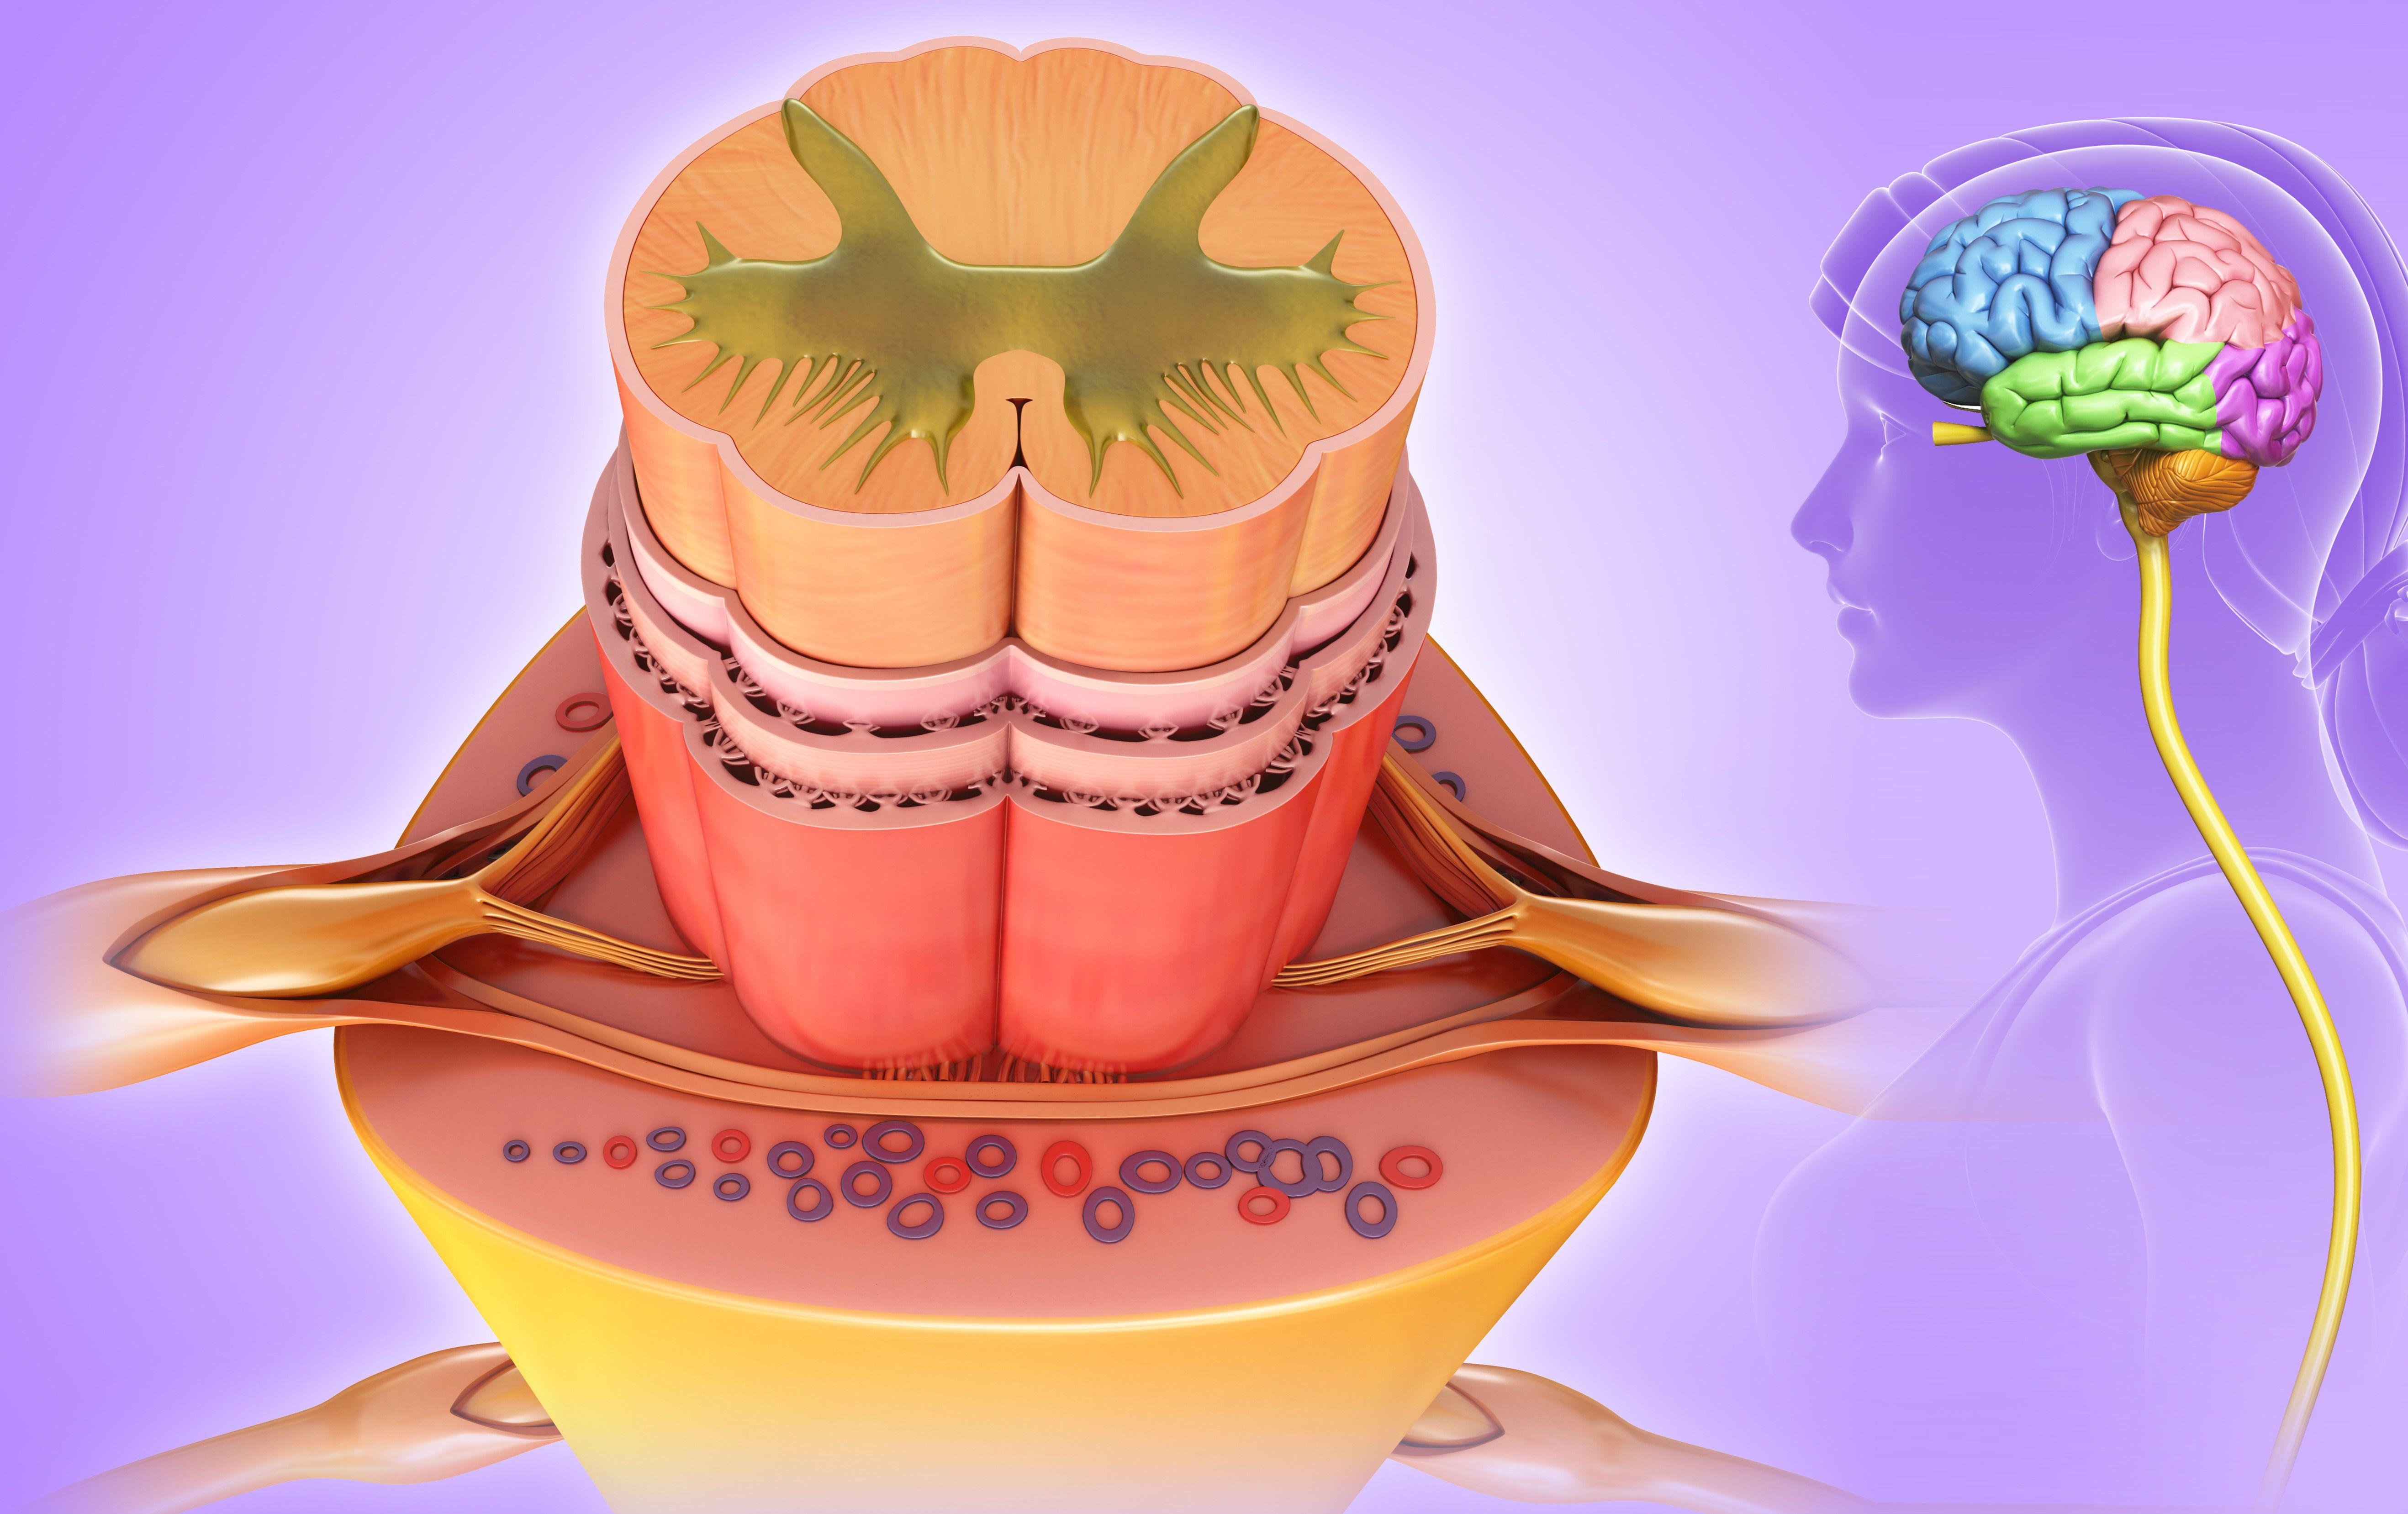 Spinal cord anatomy, illustration